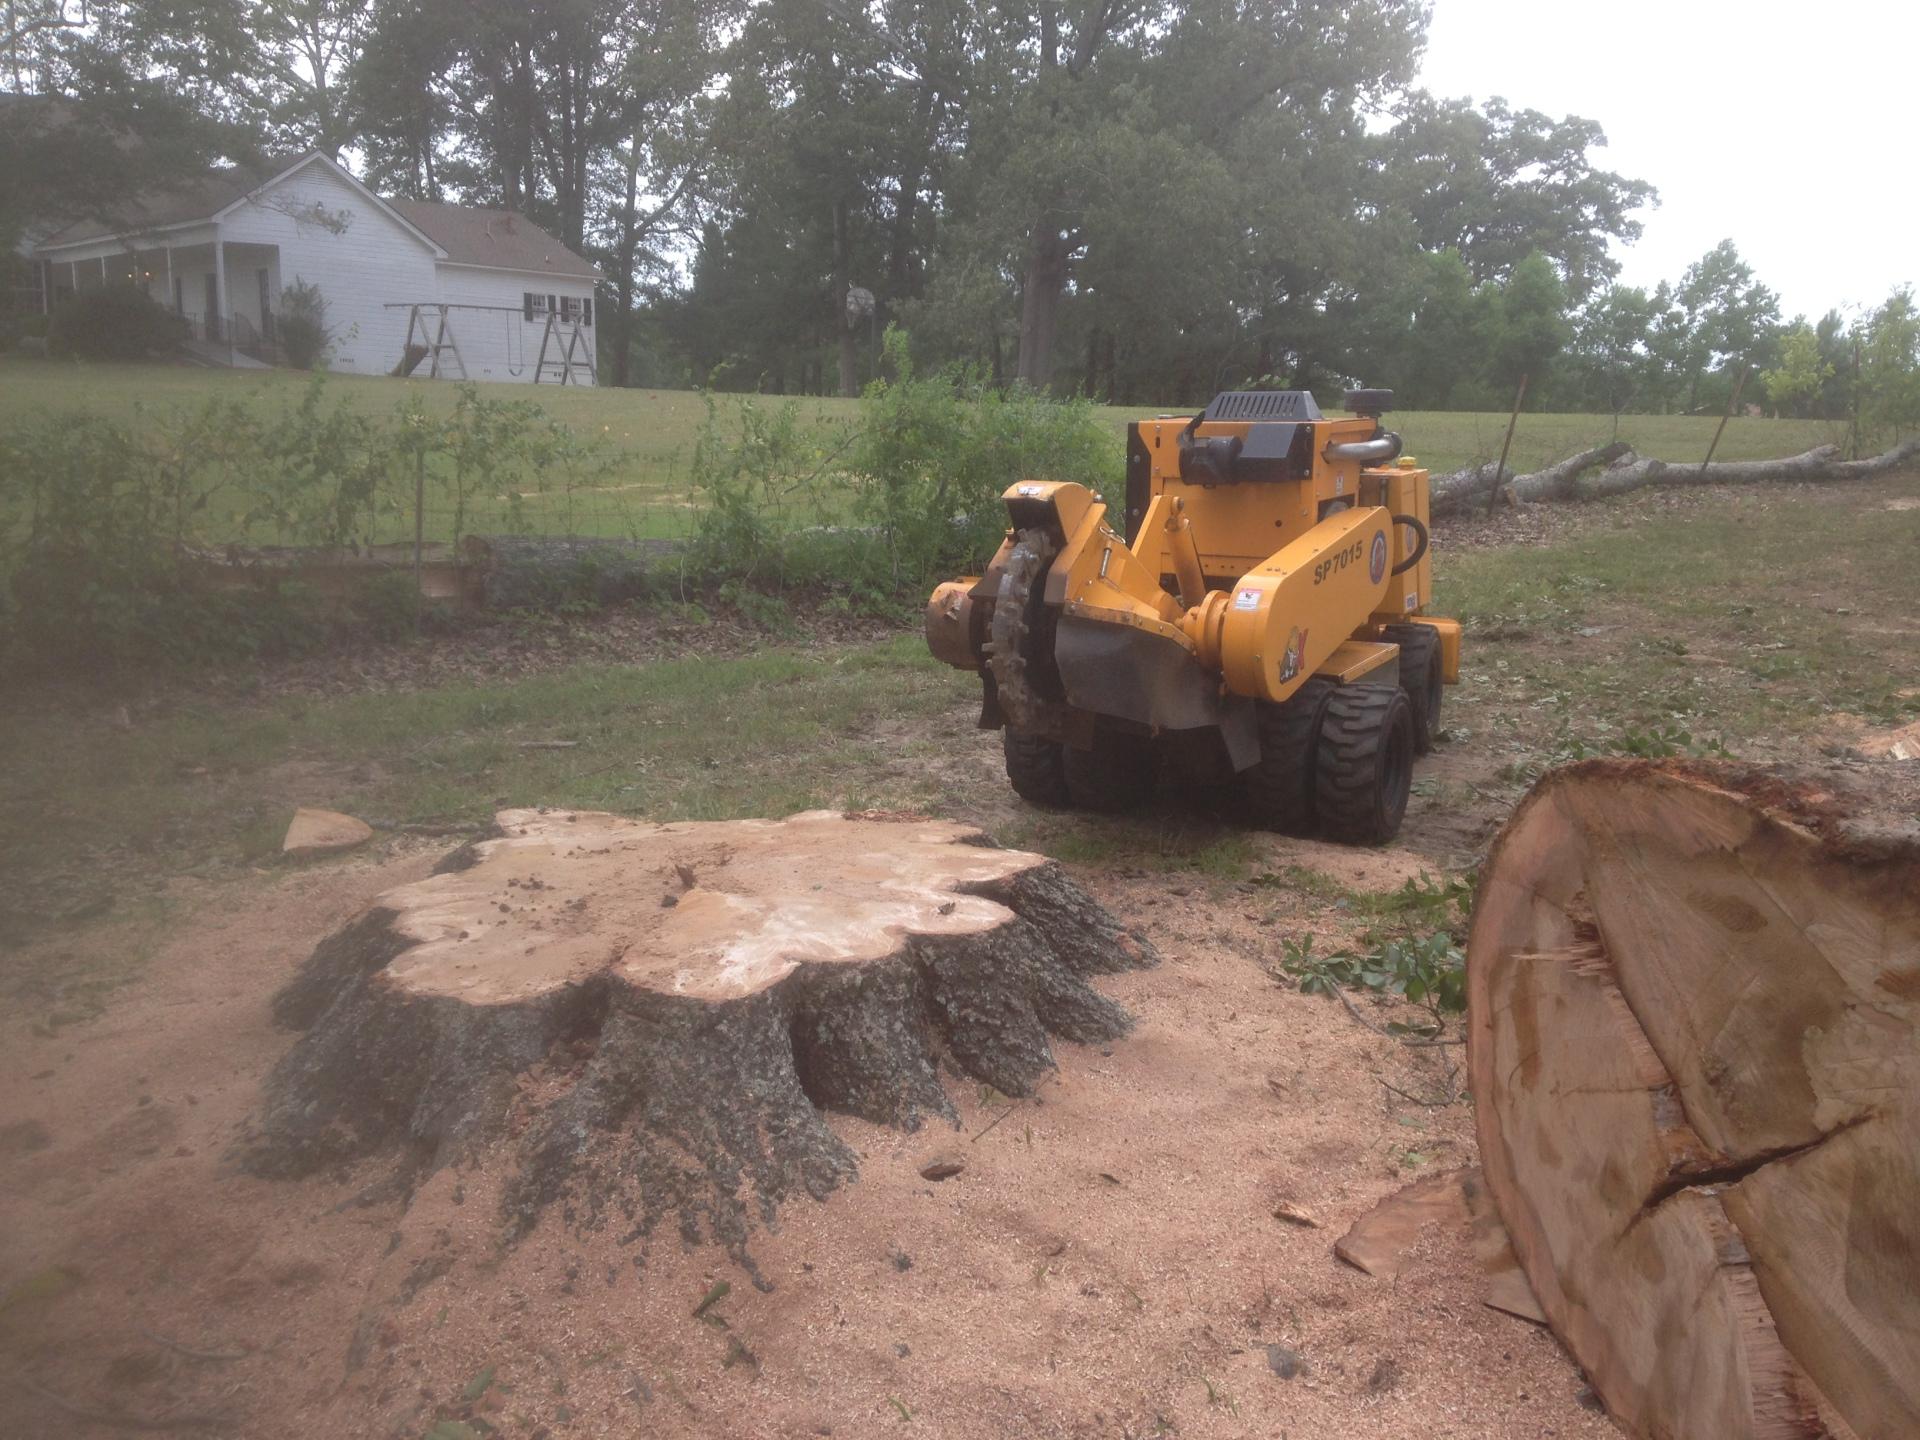 Grinding a Big Stump in Hope Hull